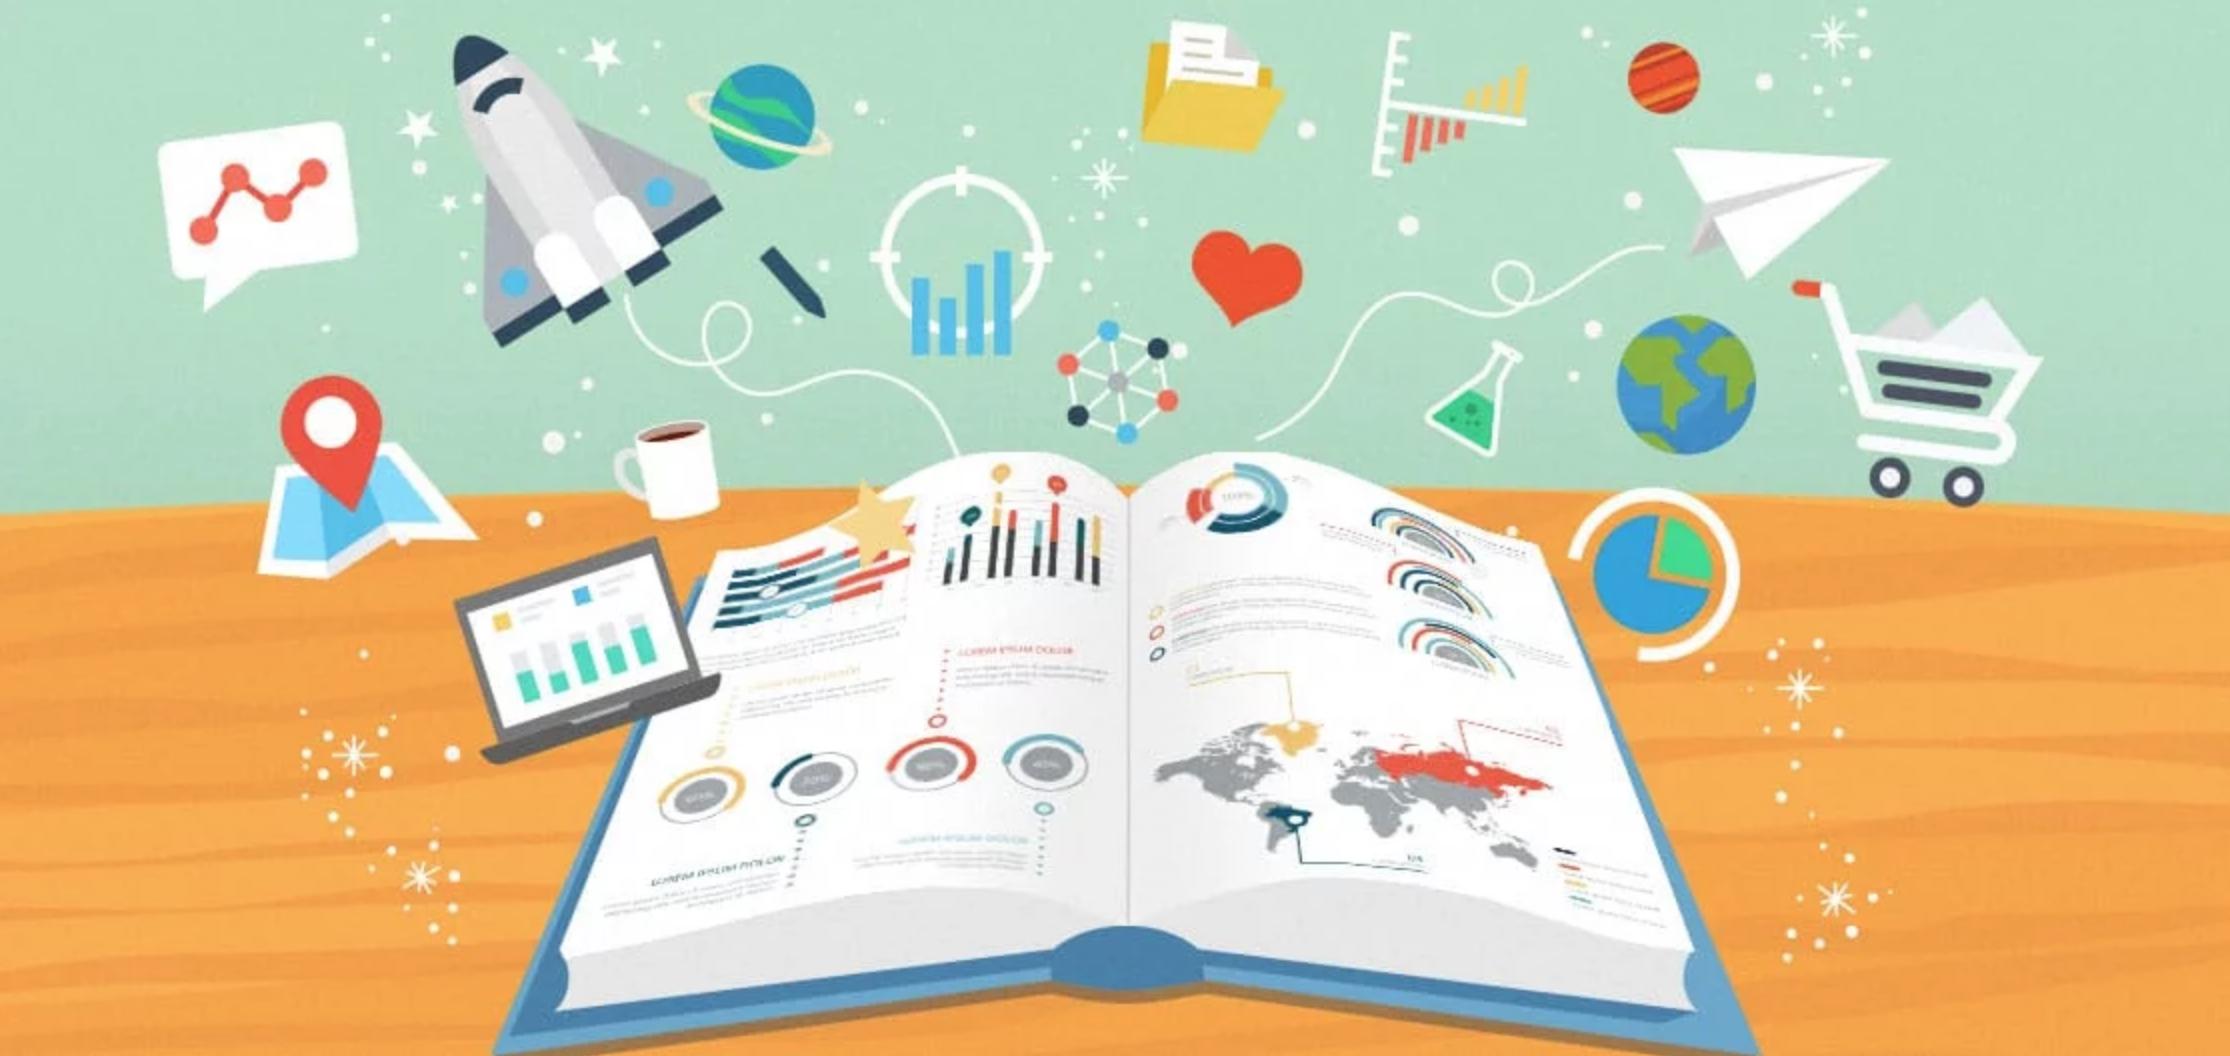 Data Storytelling: The key to creating captivating dashboards & infographics